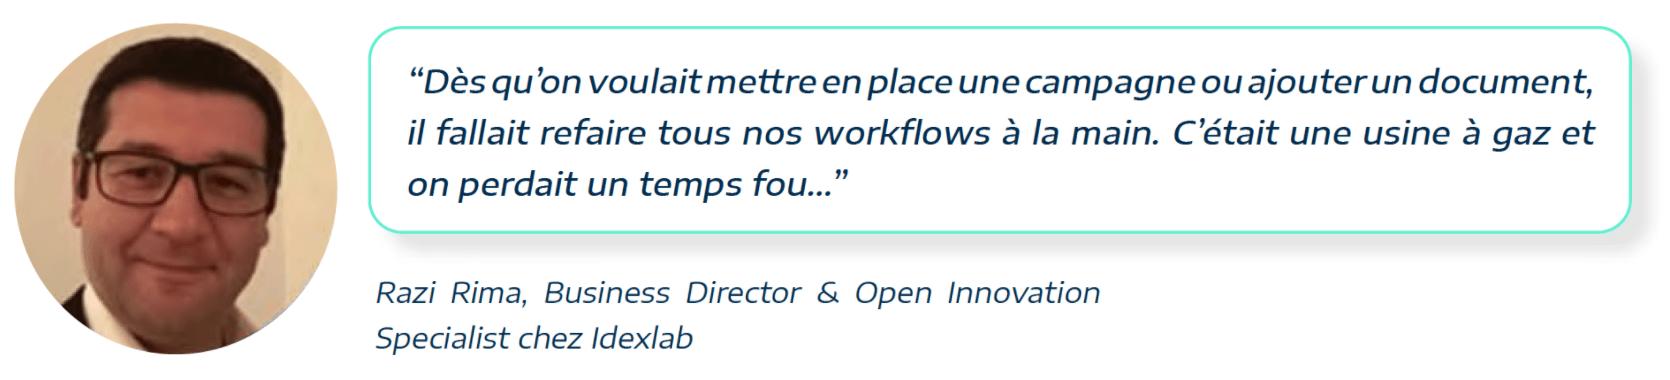 témoignage de Razi Rima de ideXlab à propos des workflows de hubspot